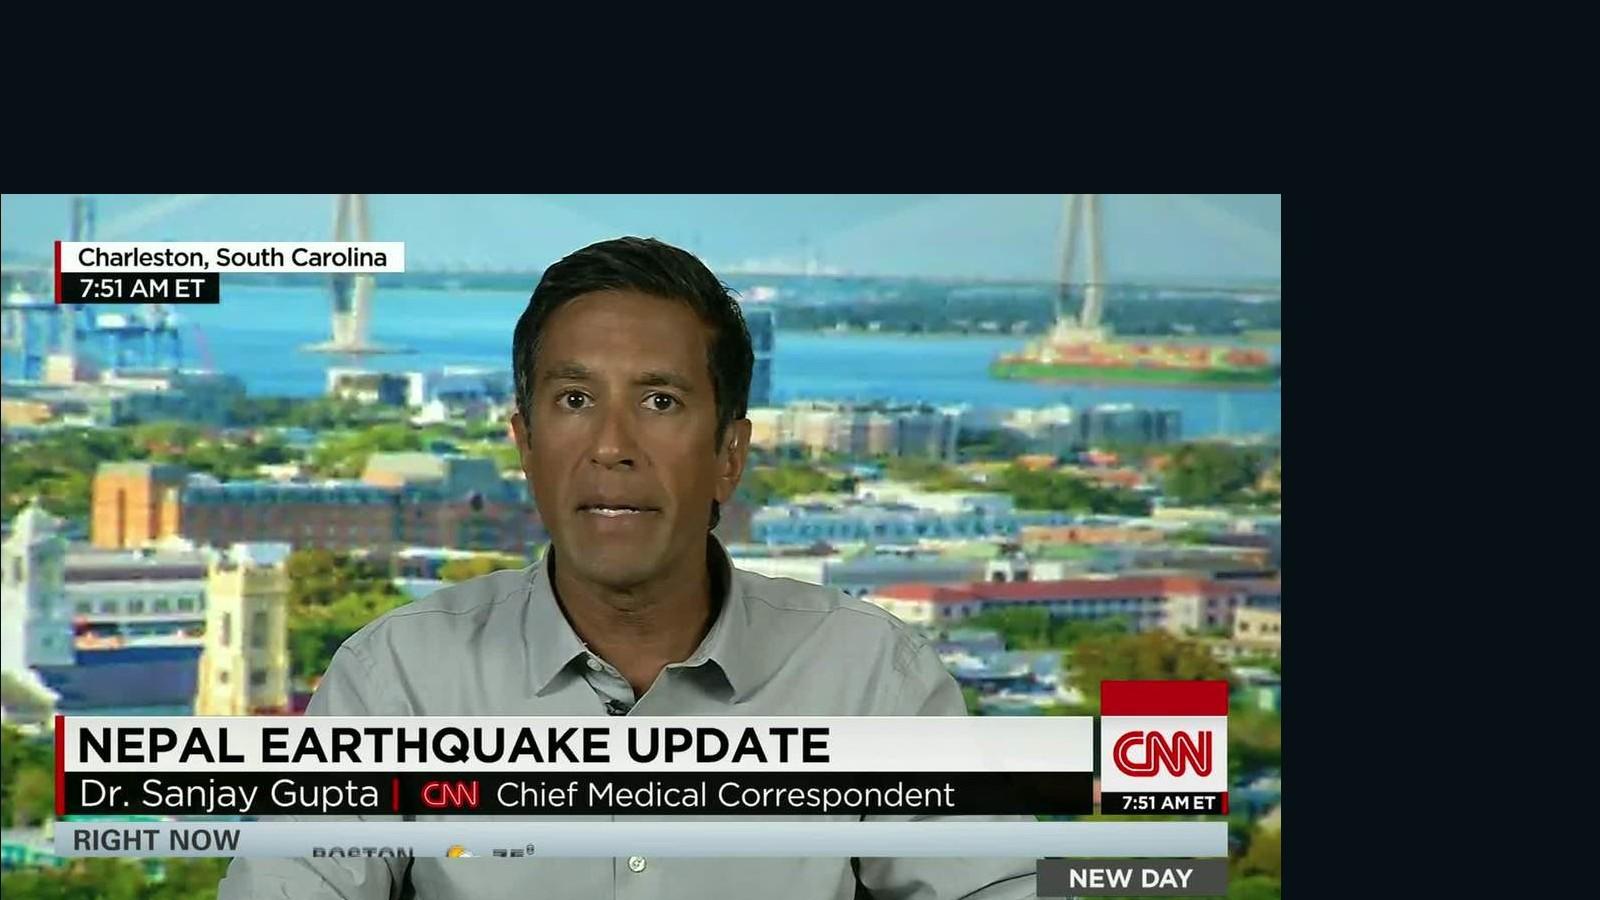 CNN Update: Sanjay Gupta: Nepal Earthquake Update